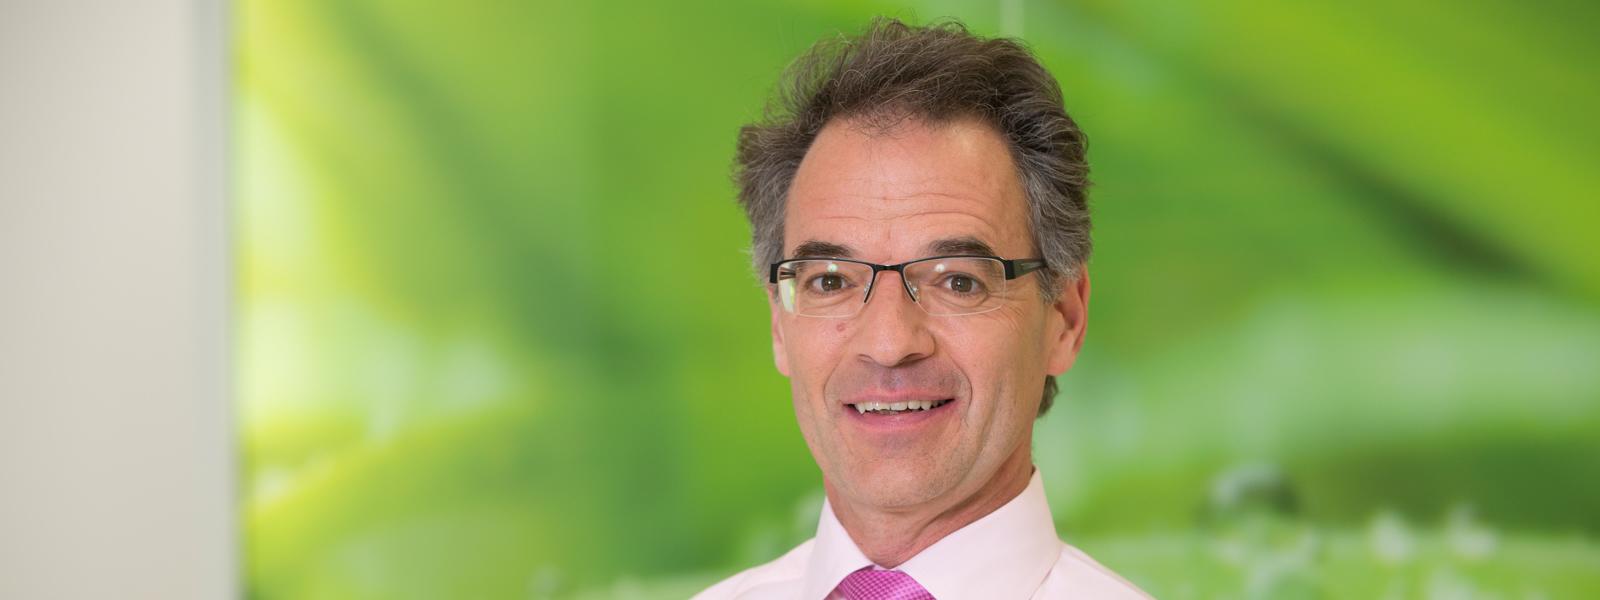 PD Dr. med. Gernot Seipelt